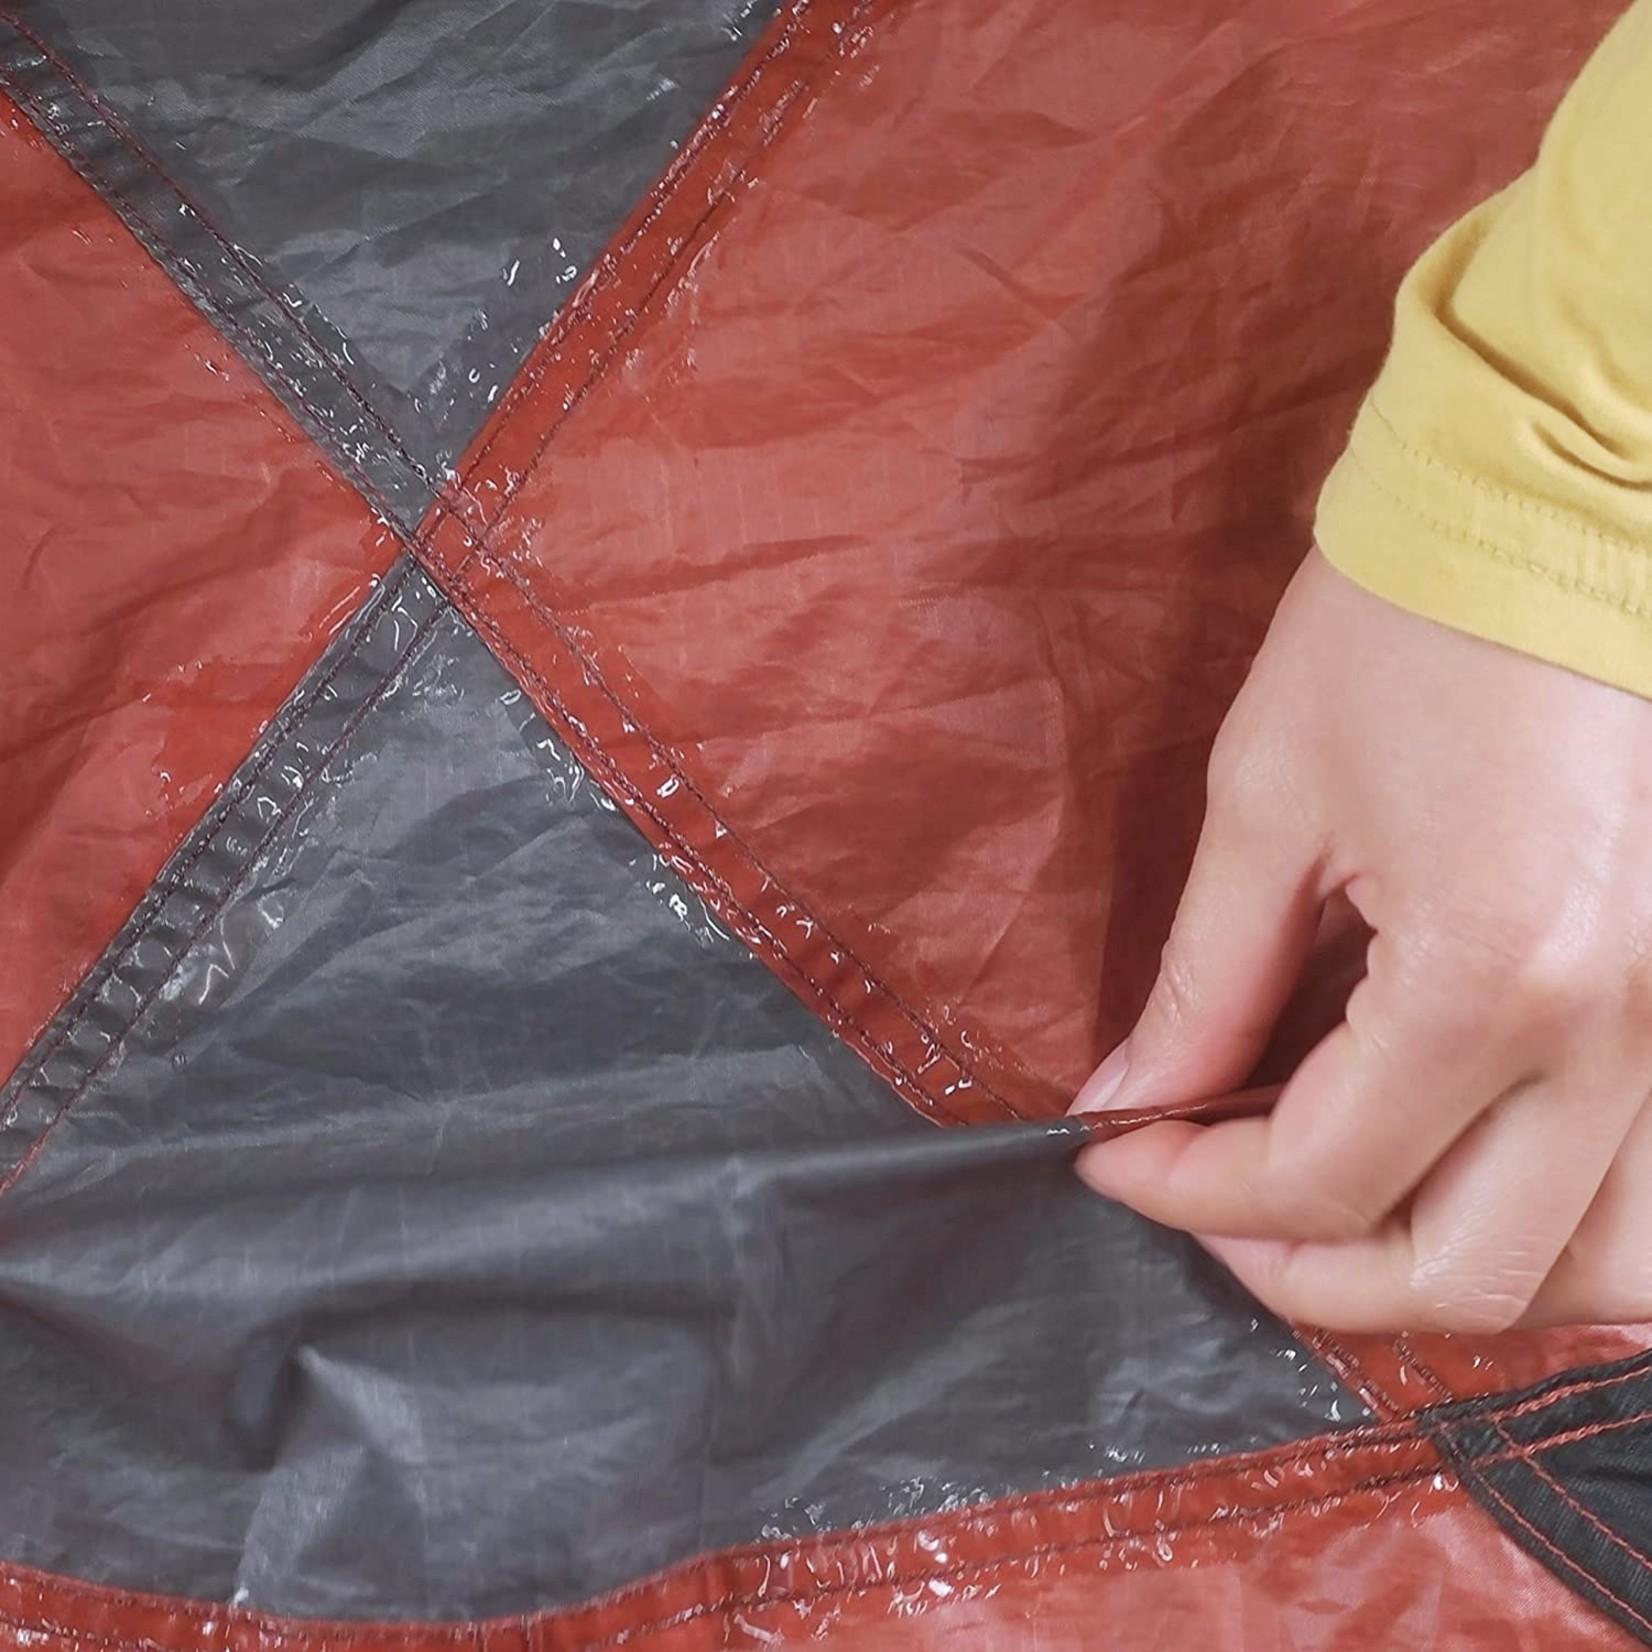 Seam Grip WP Waterproof Sealant and Adhesive